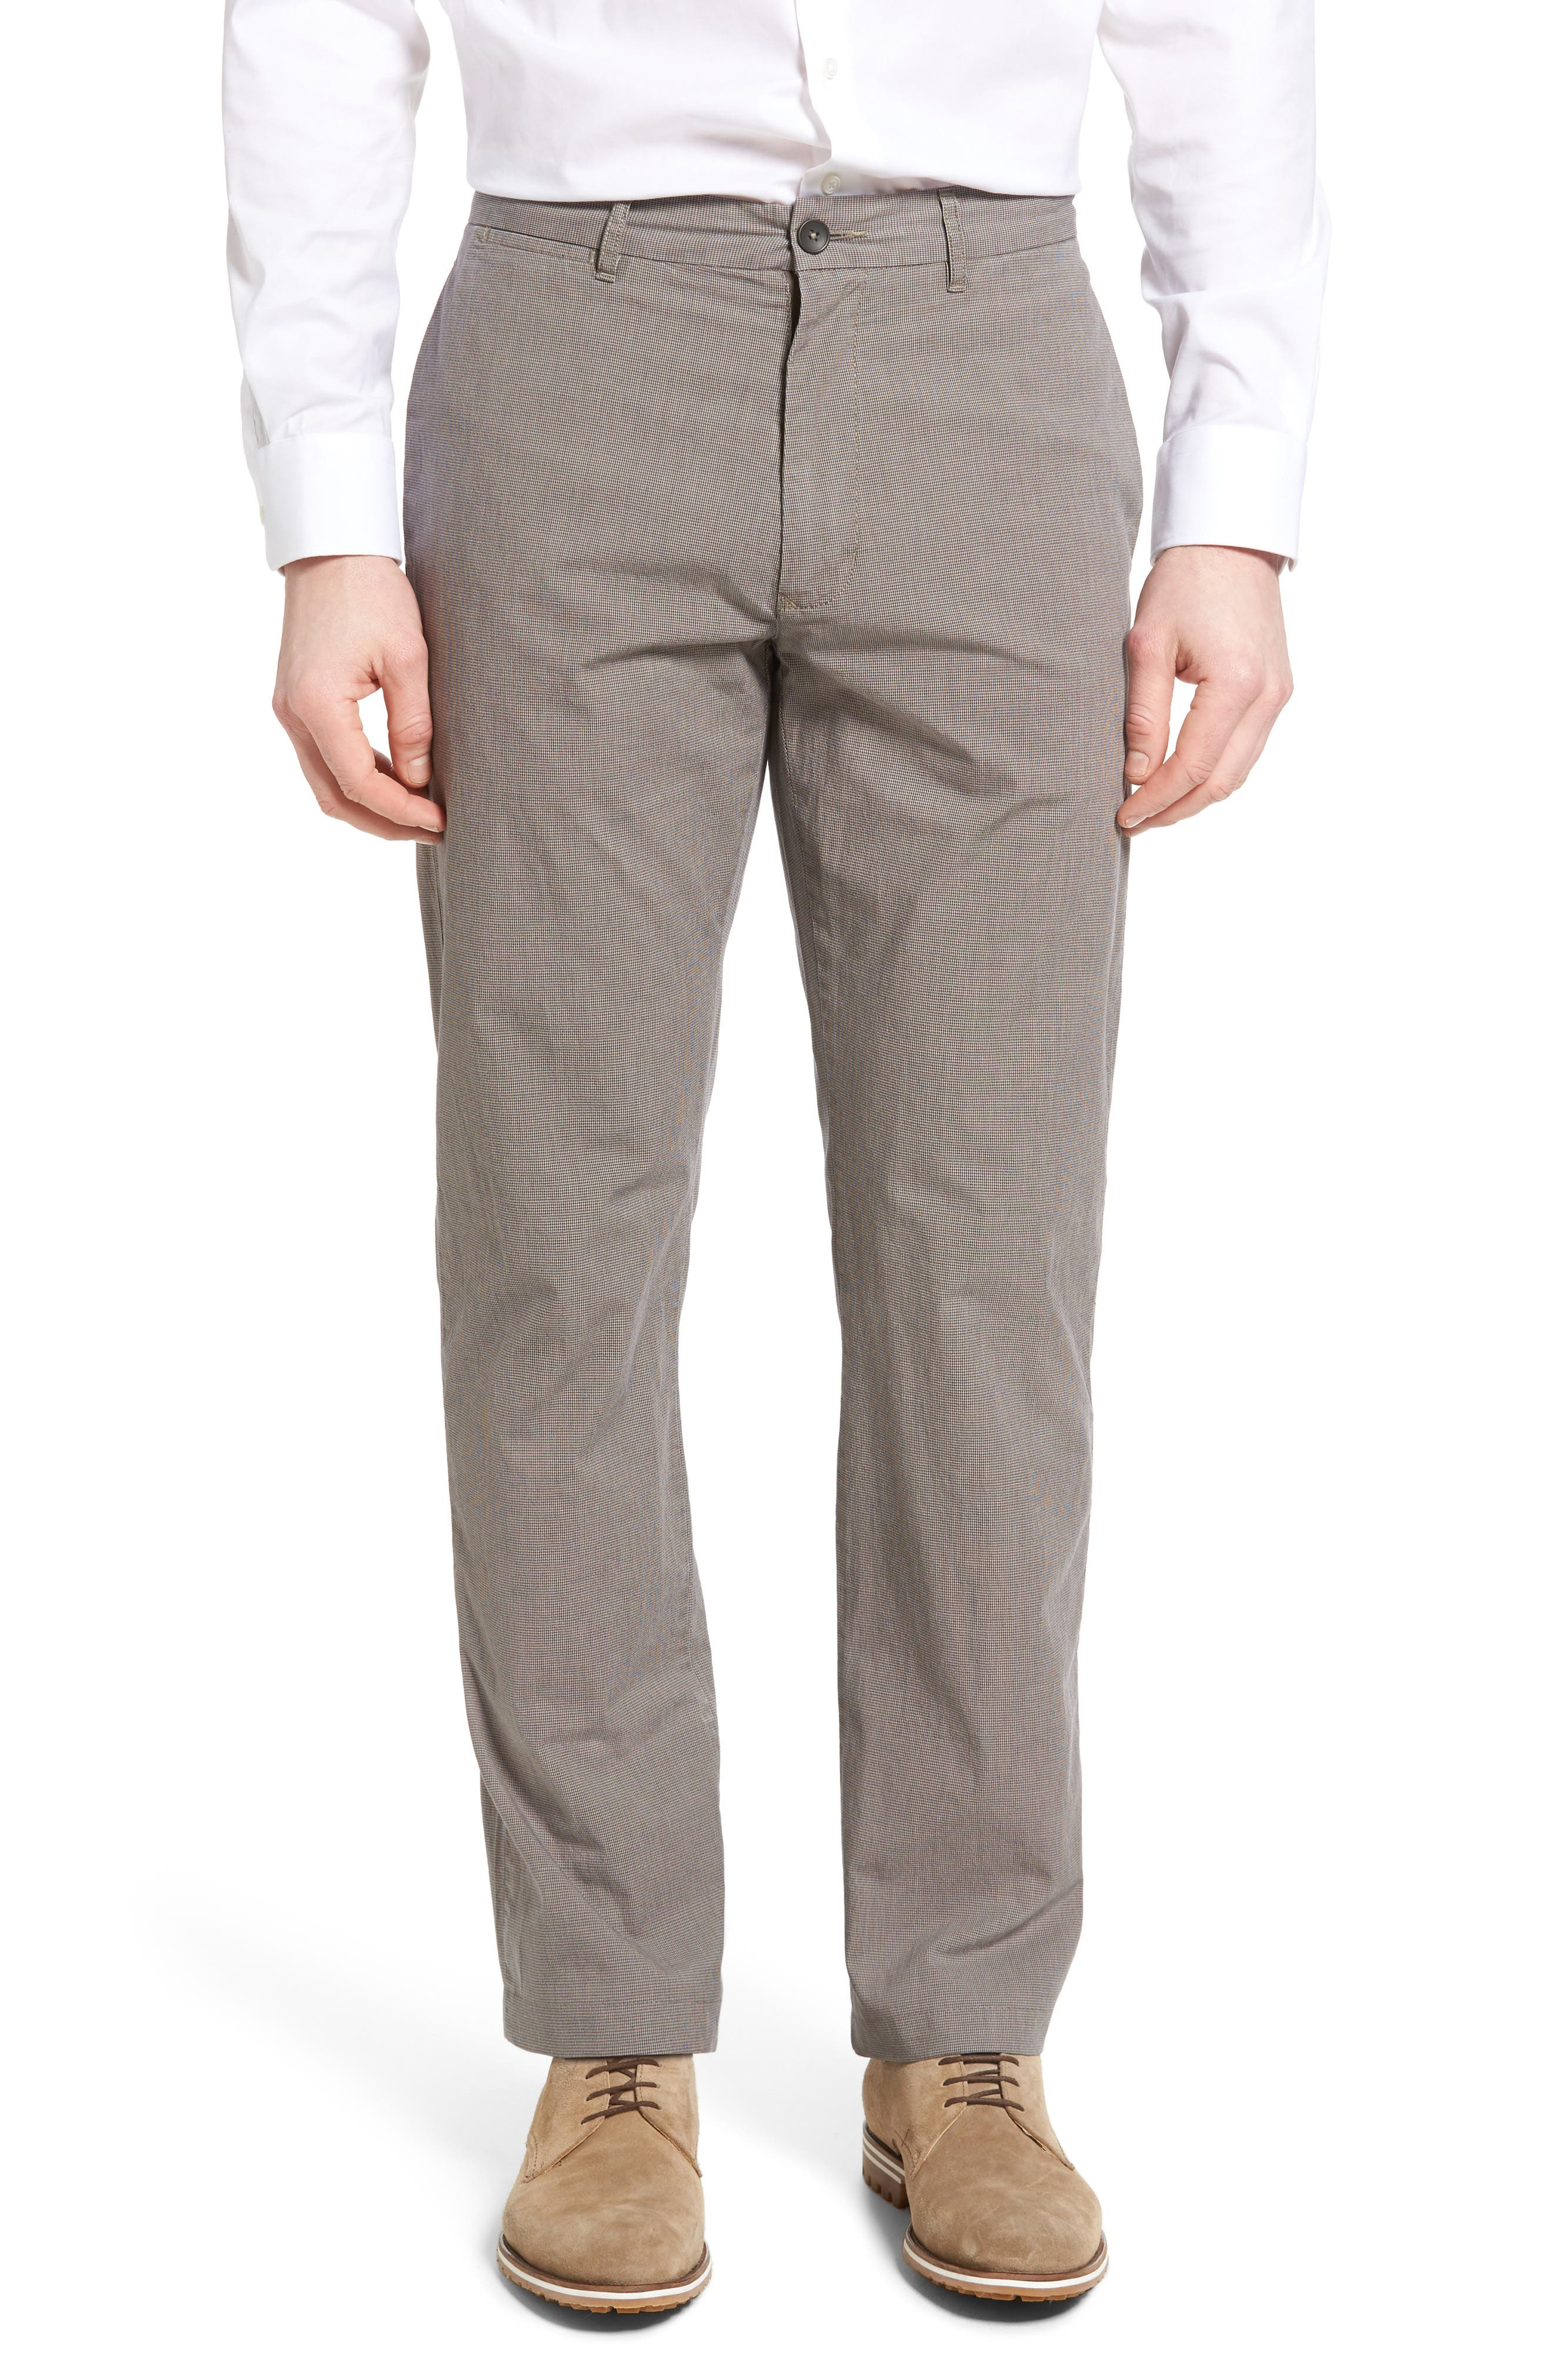 Rodd & Gunn Woodward Regular Fit Trousers